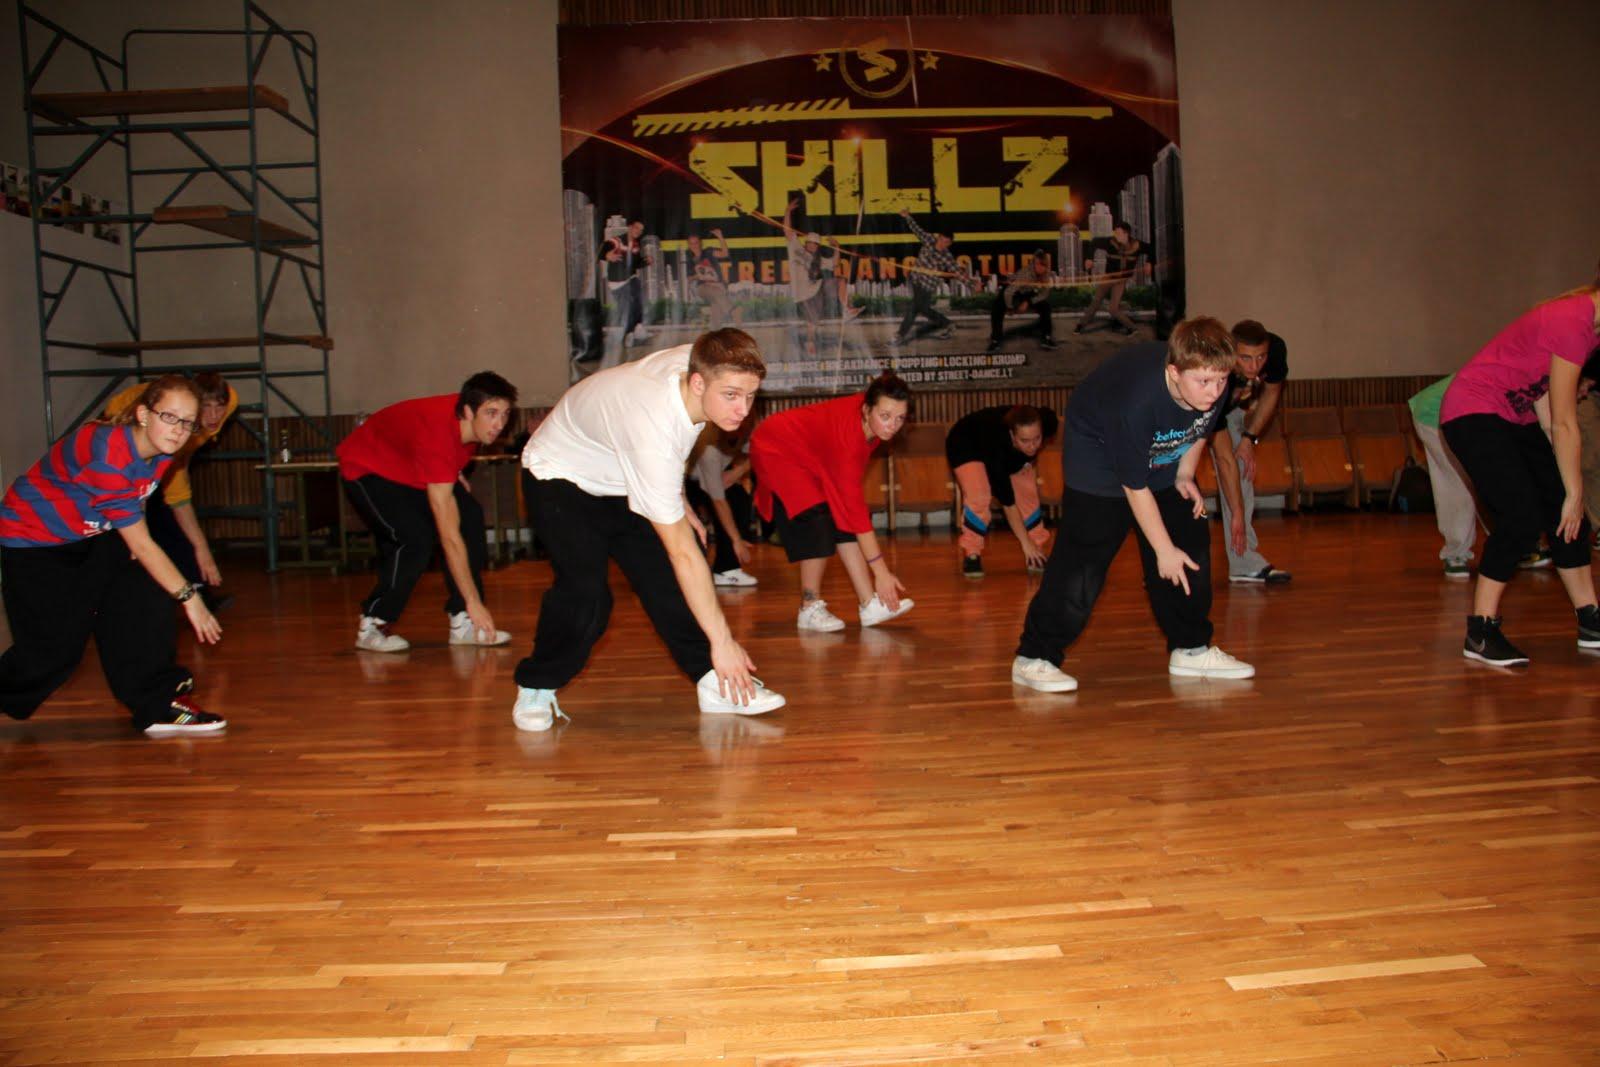 Dre10 Workshop @SKILLZ - IMG_5705.JPG